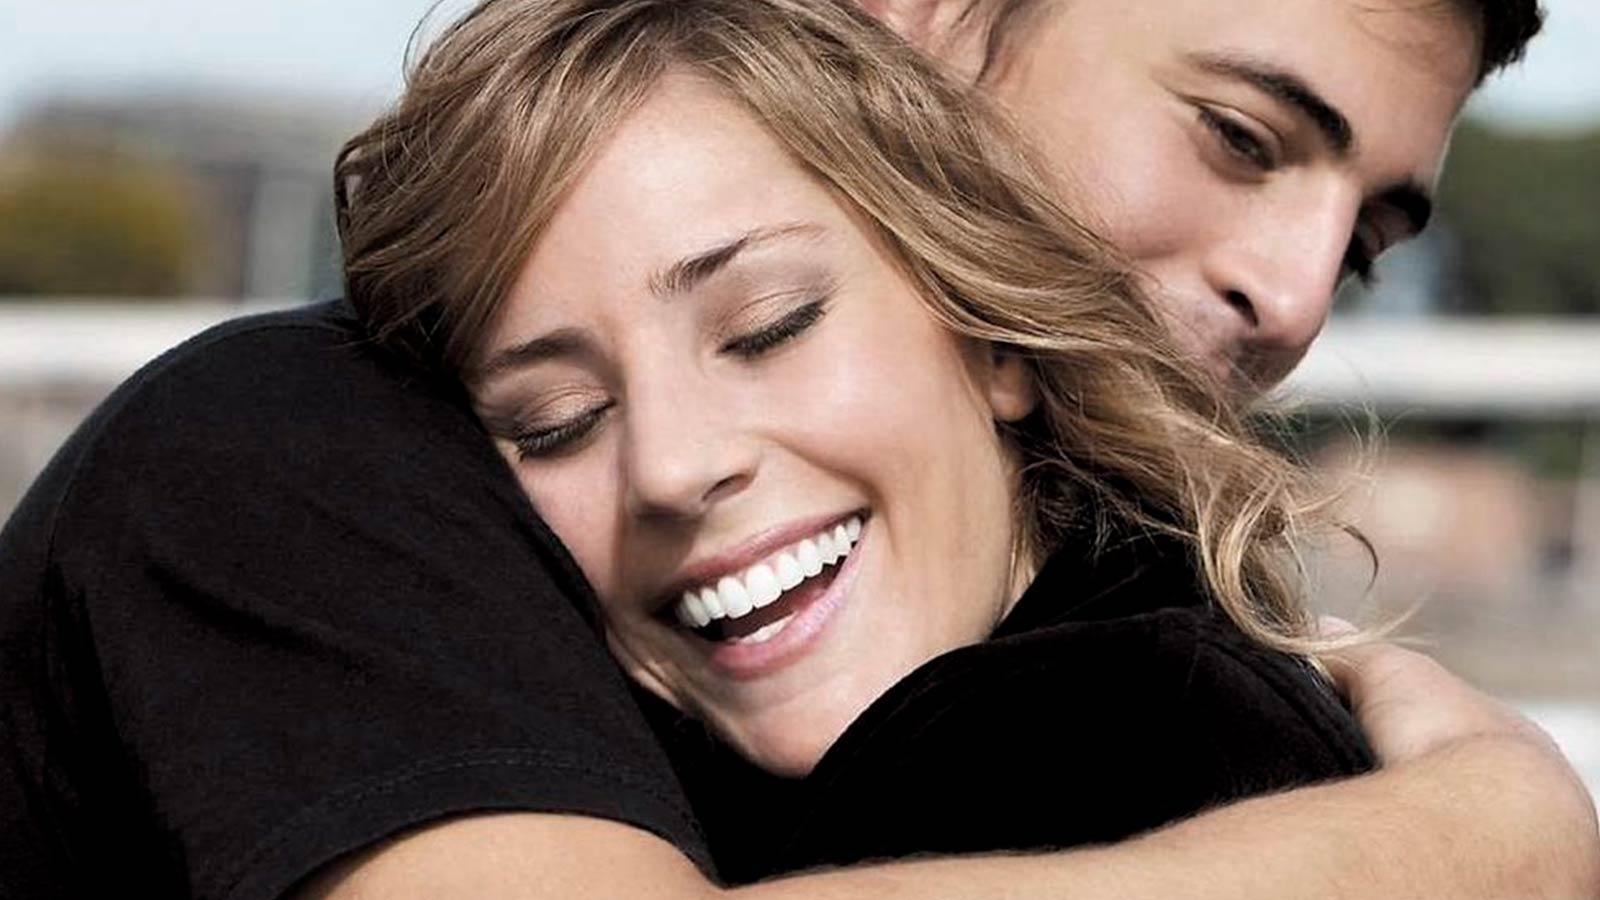 abrazo-sonrisa